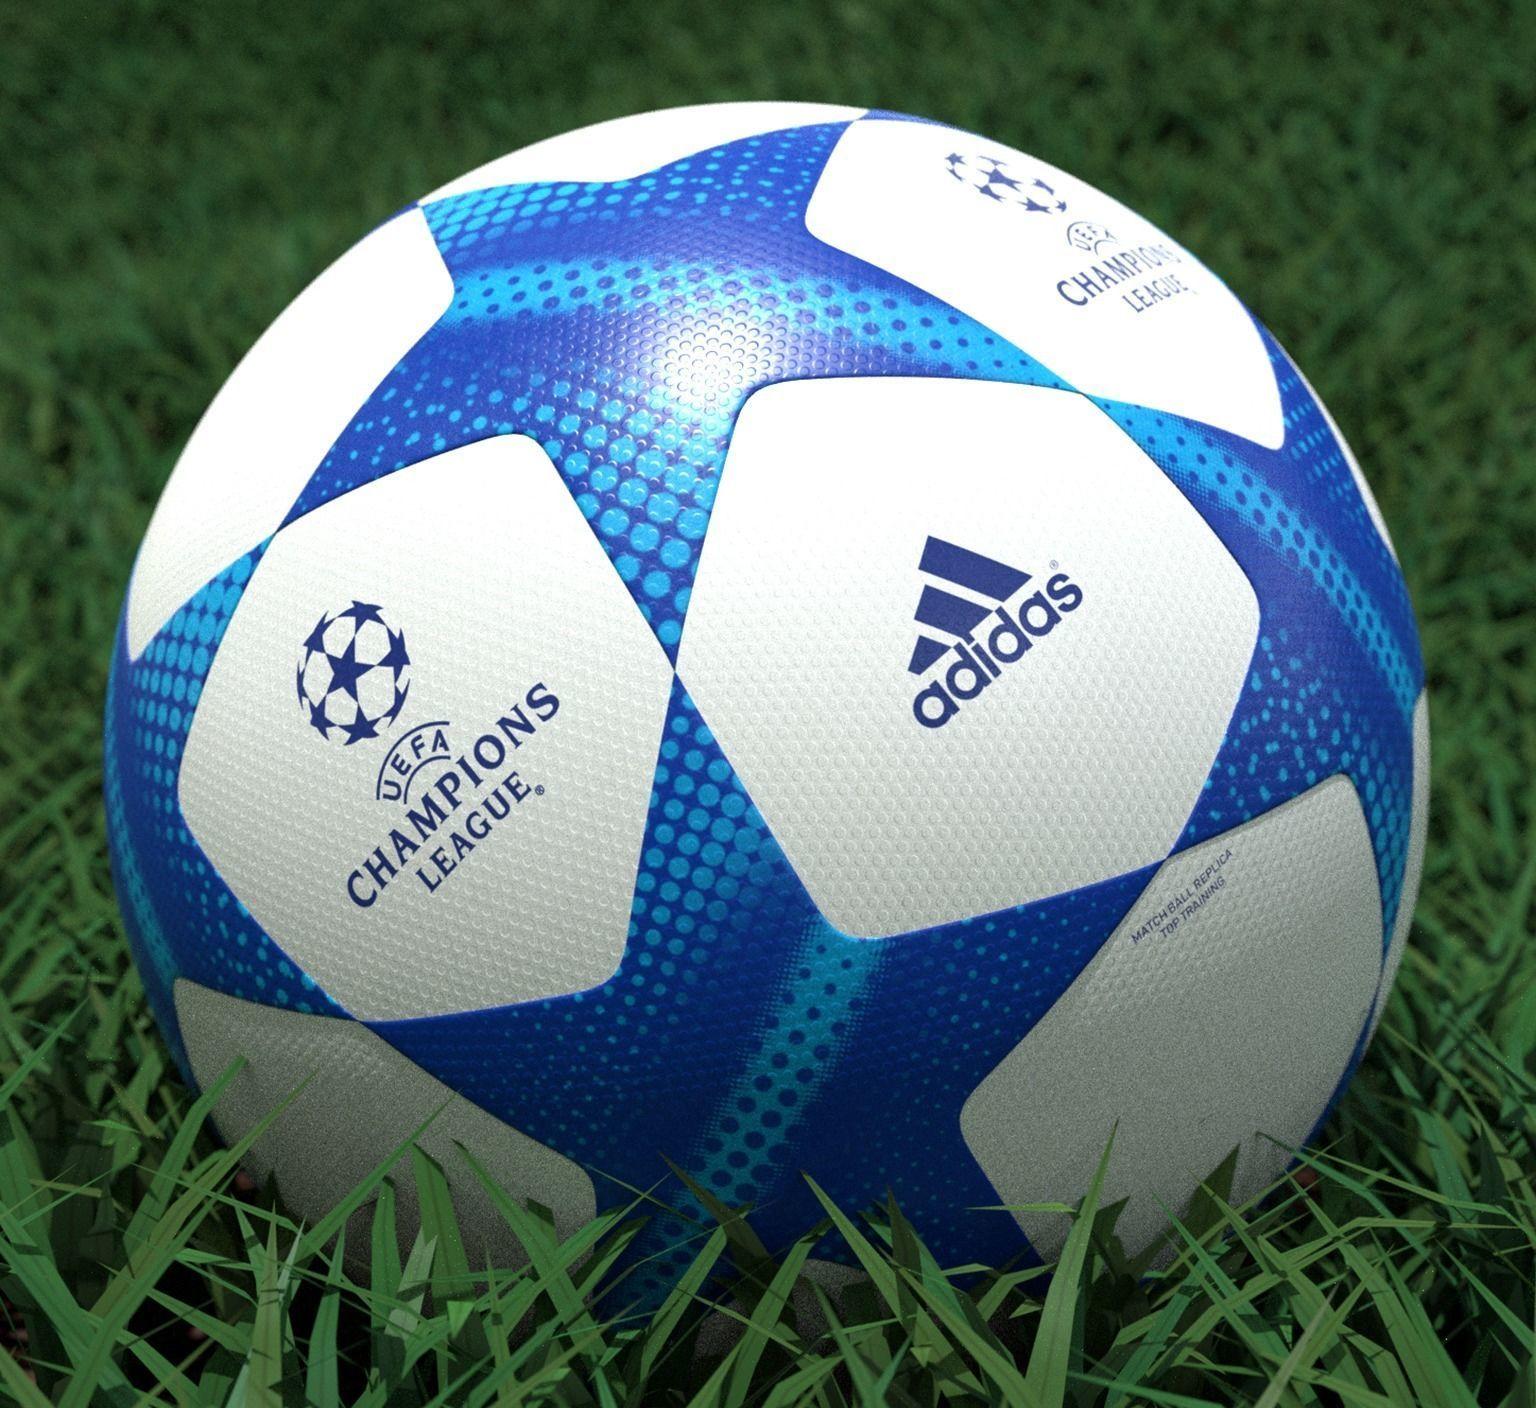 adidas uefa champions league soccer ball 3d model adidas uefa champions league soccer ball 3d model